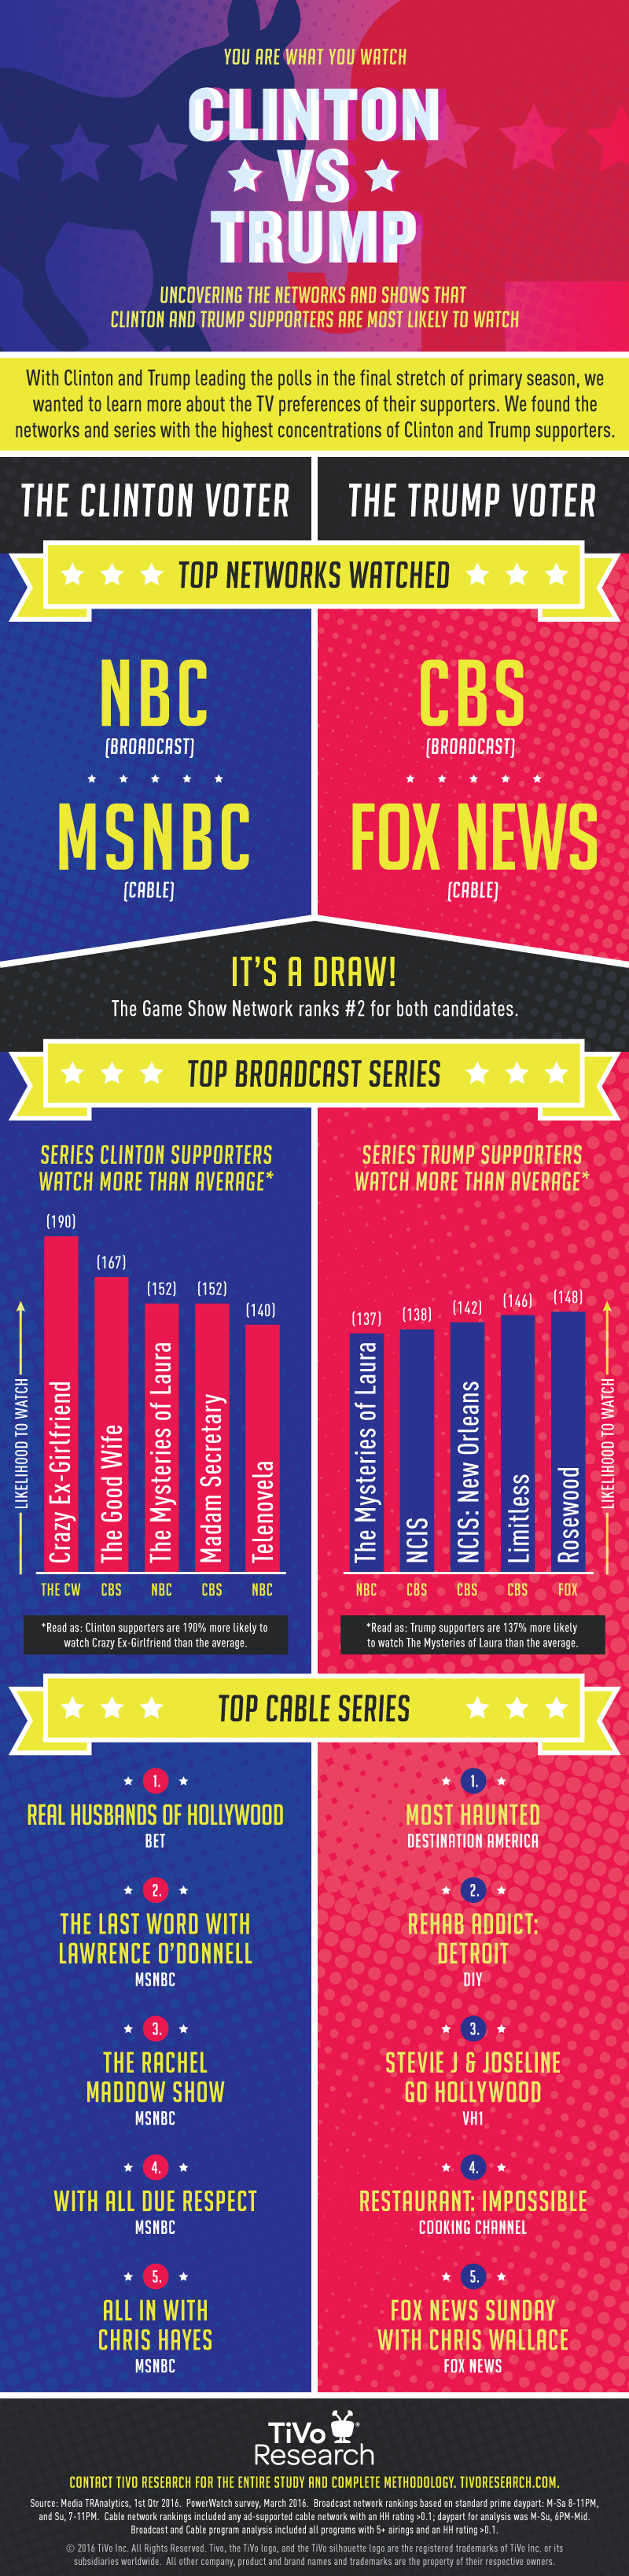 TiVo-Research_ClintonVSTrump_Infographic-Blog-1